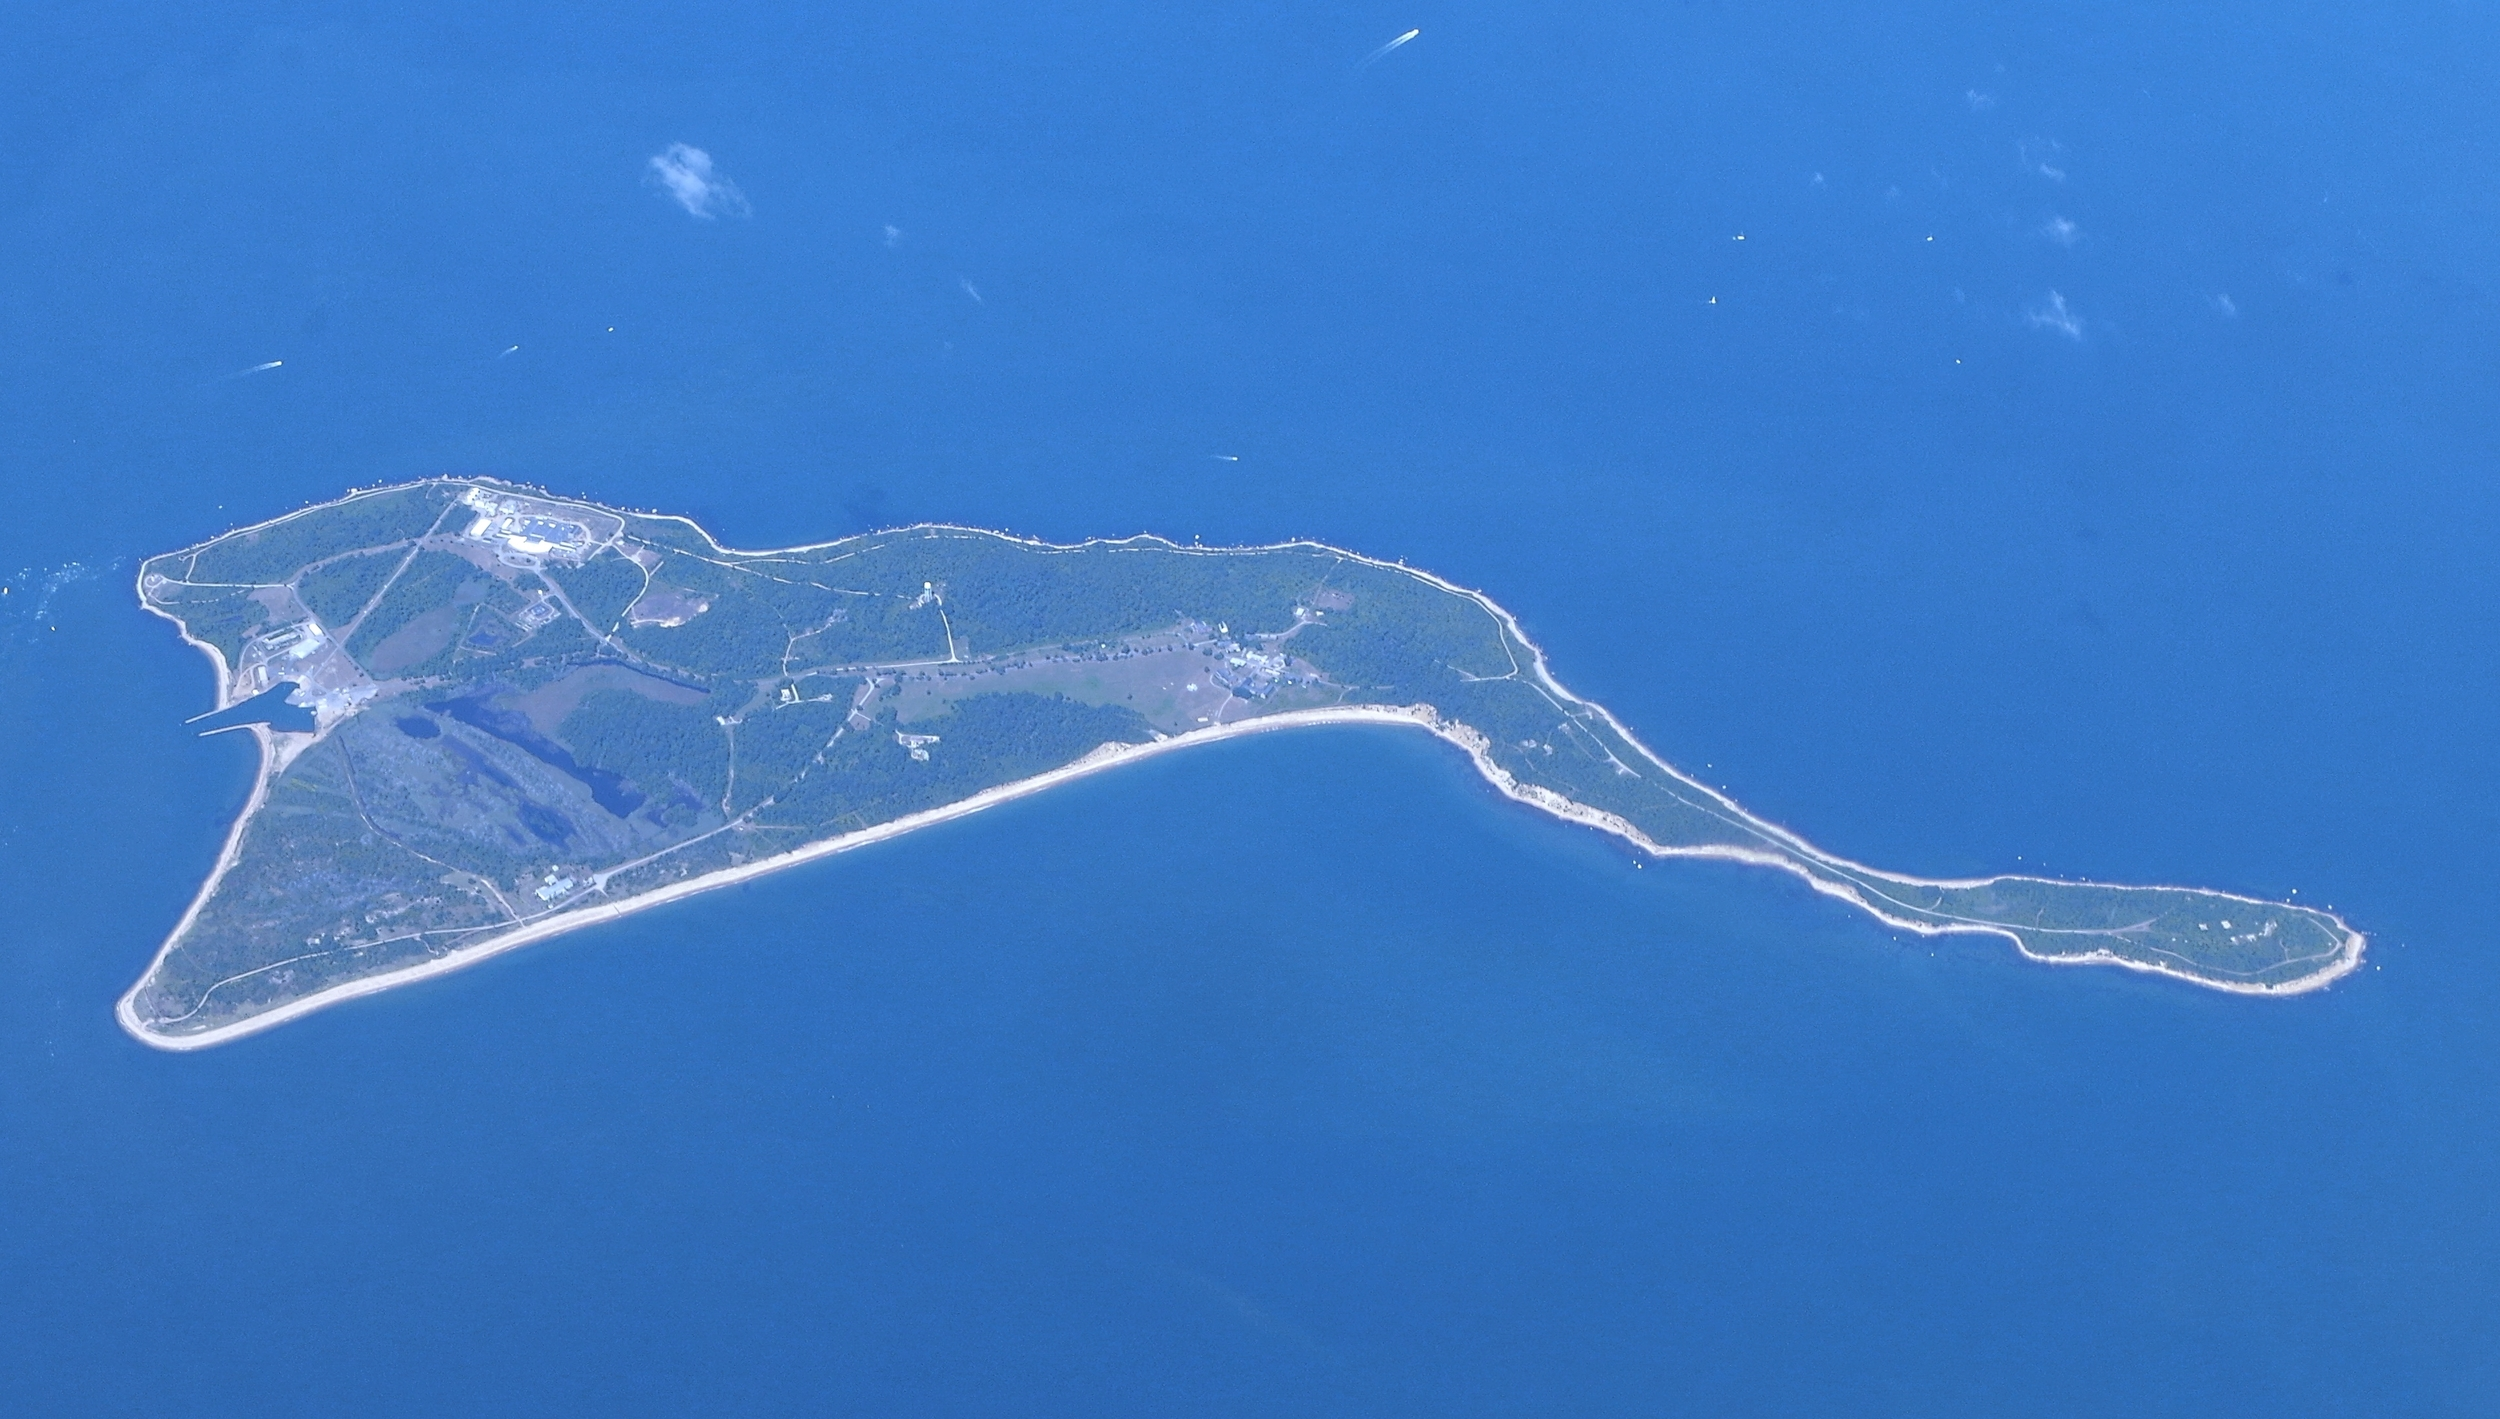 Plum Island, NY, USA – August 24, 2014